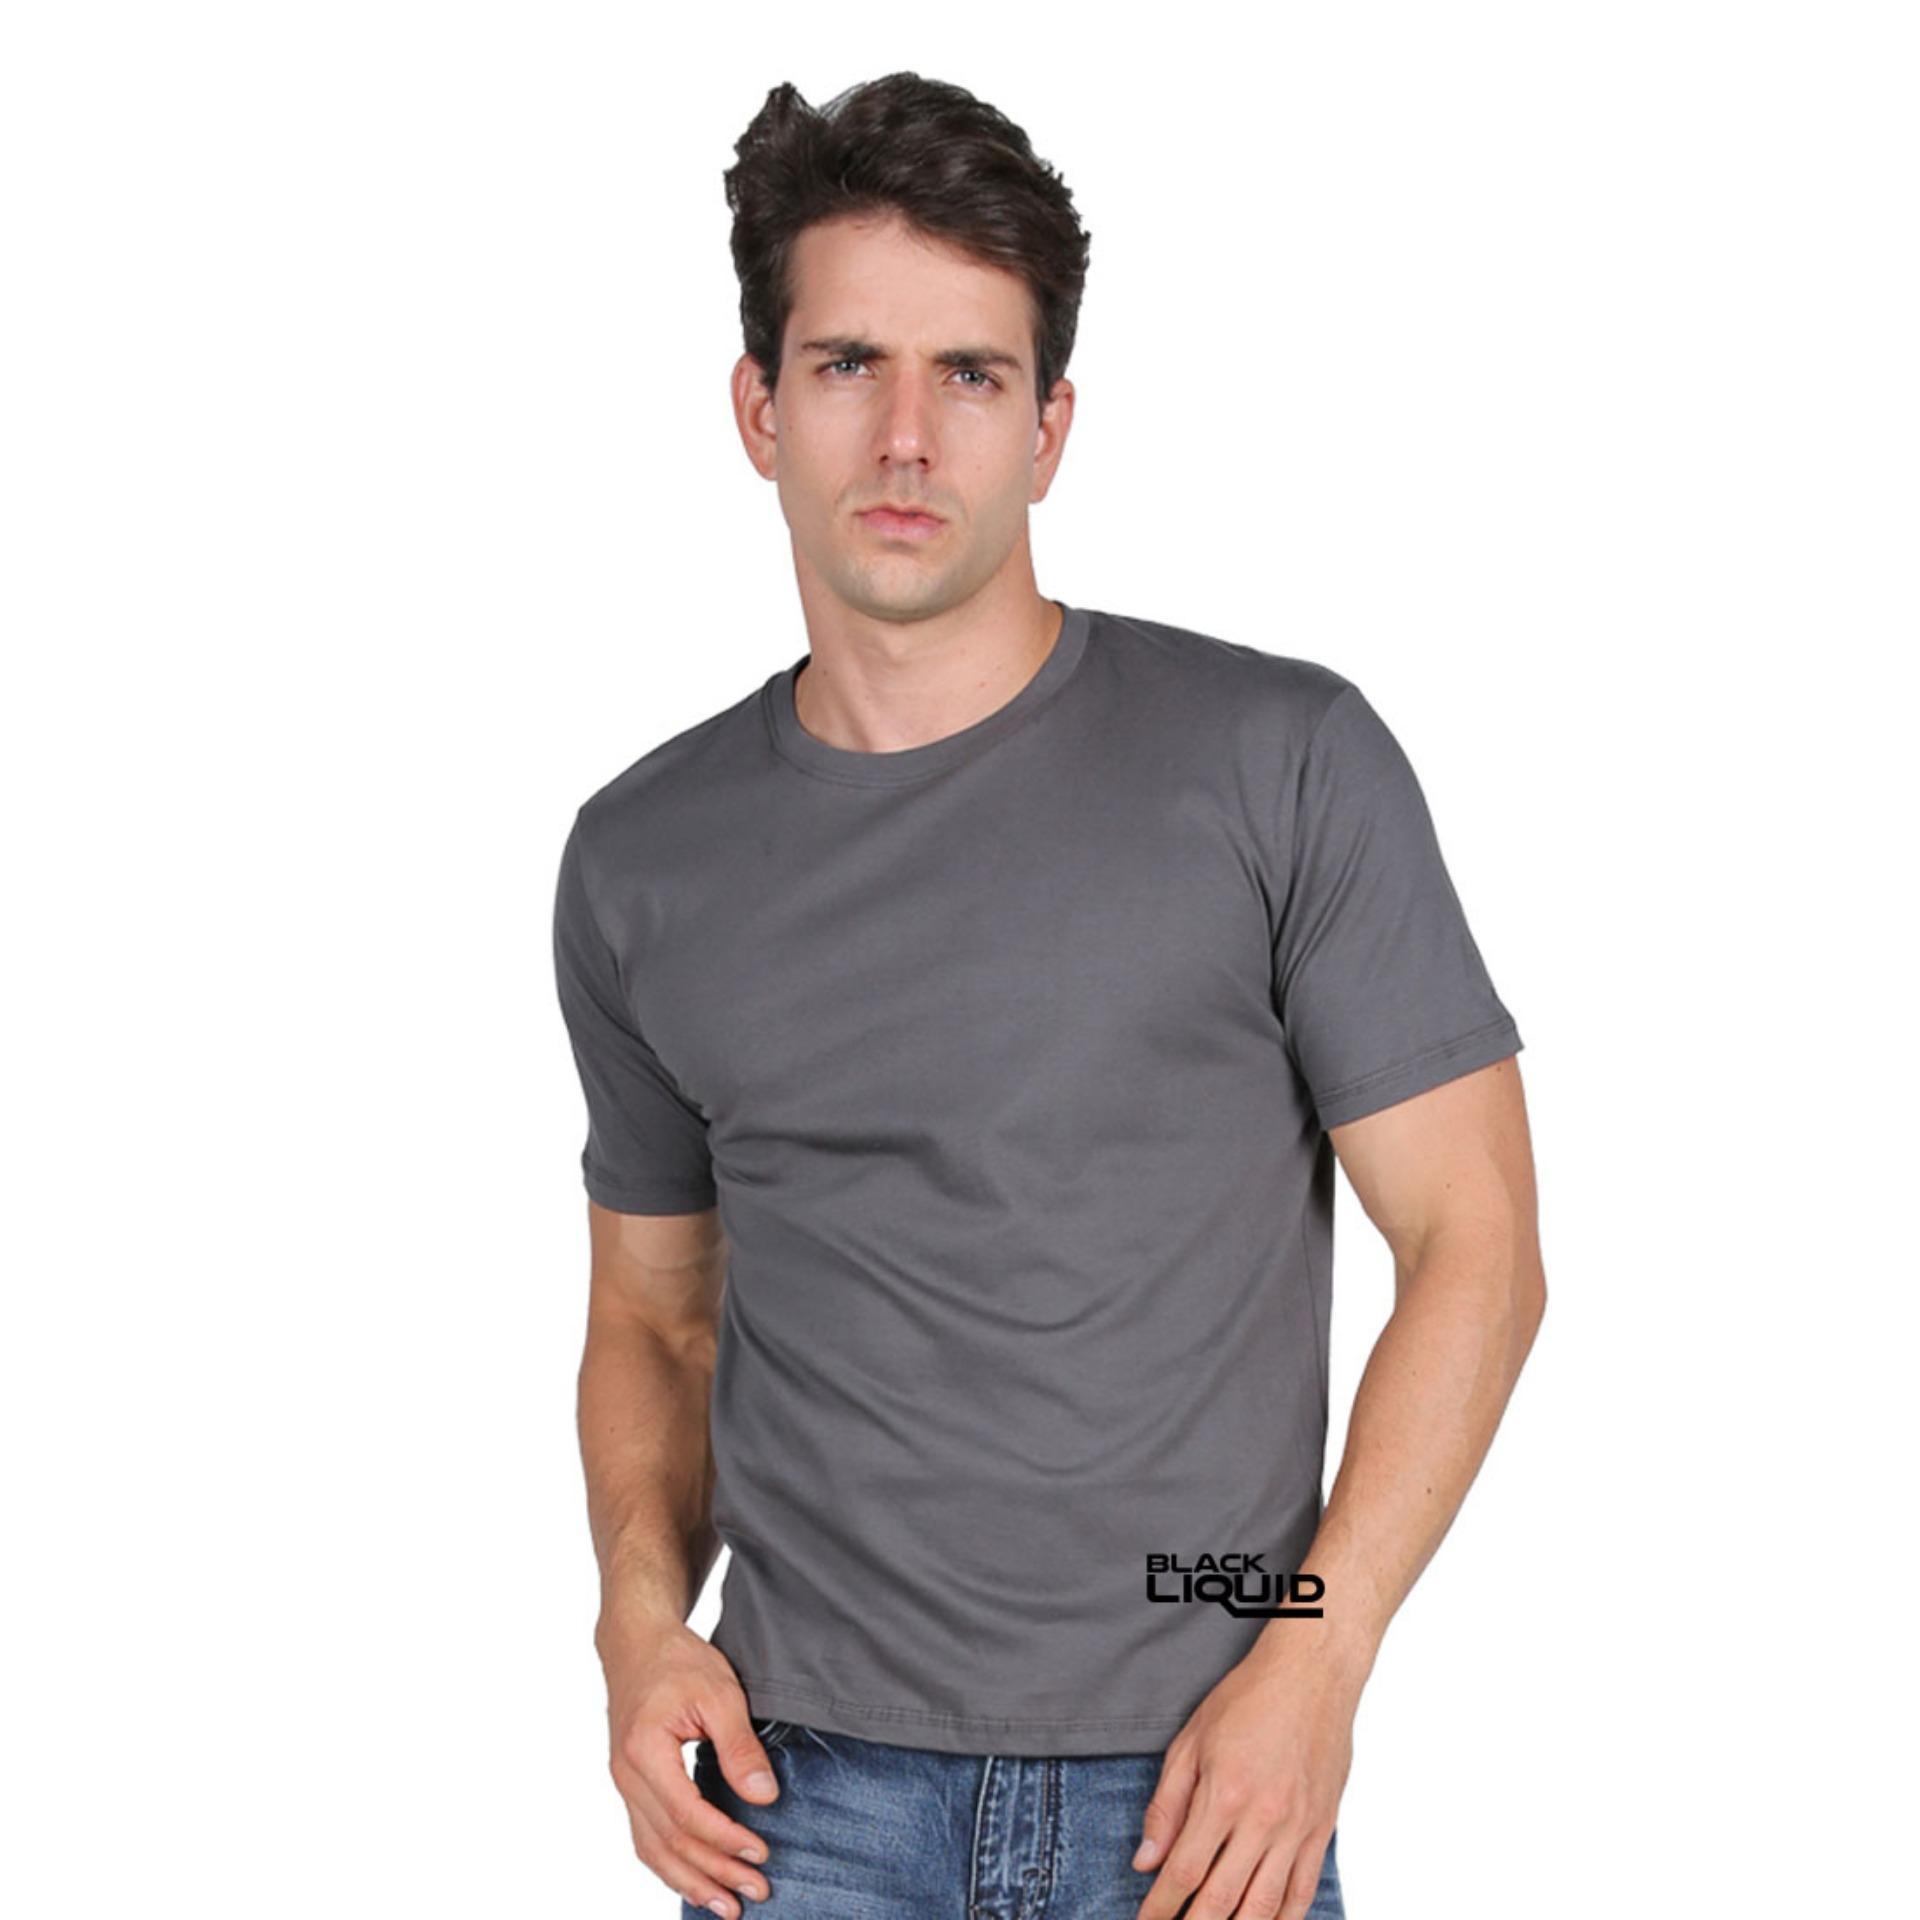 HARGA DISKON Black Liquid Kaos Pria Polos Premium T-Shirt Lengan ... 02c33a8570